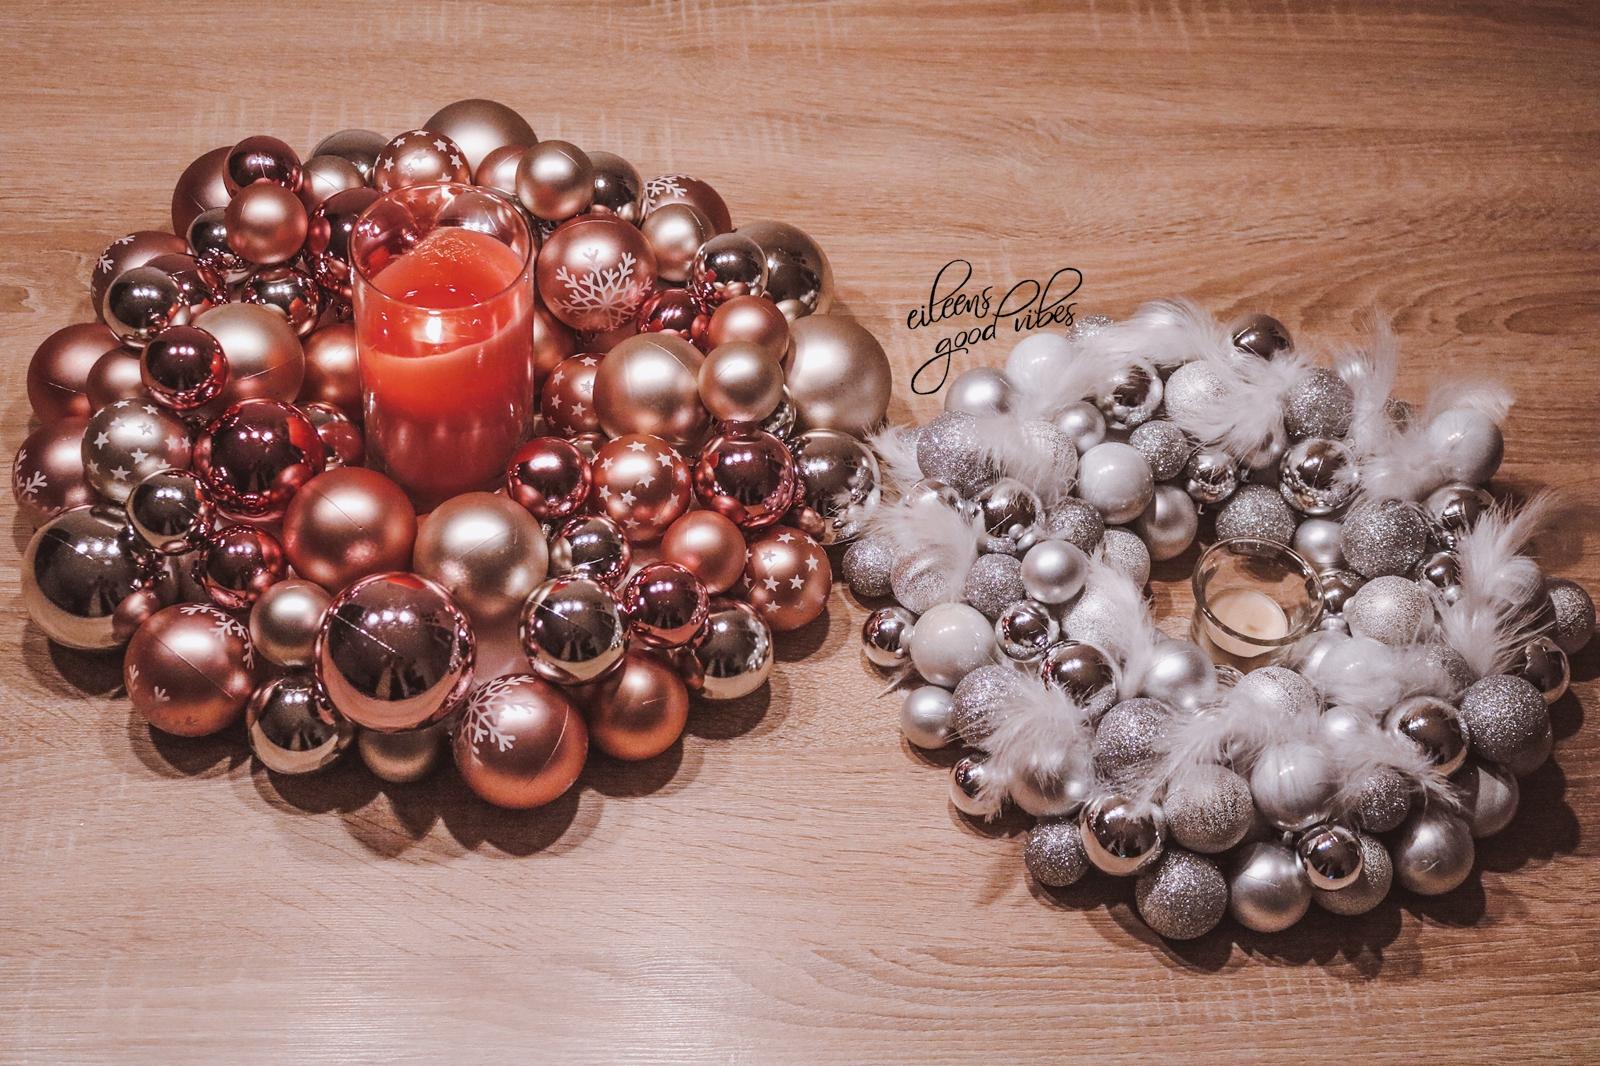 DIY Adventskranz, Hygge, eileens good vibes